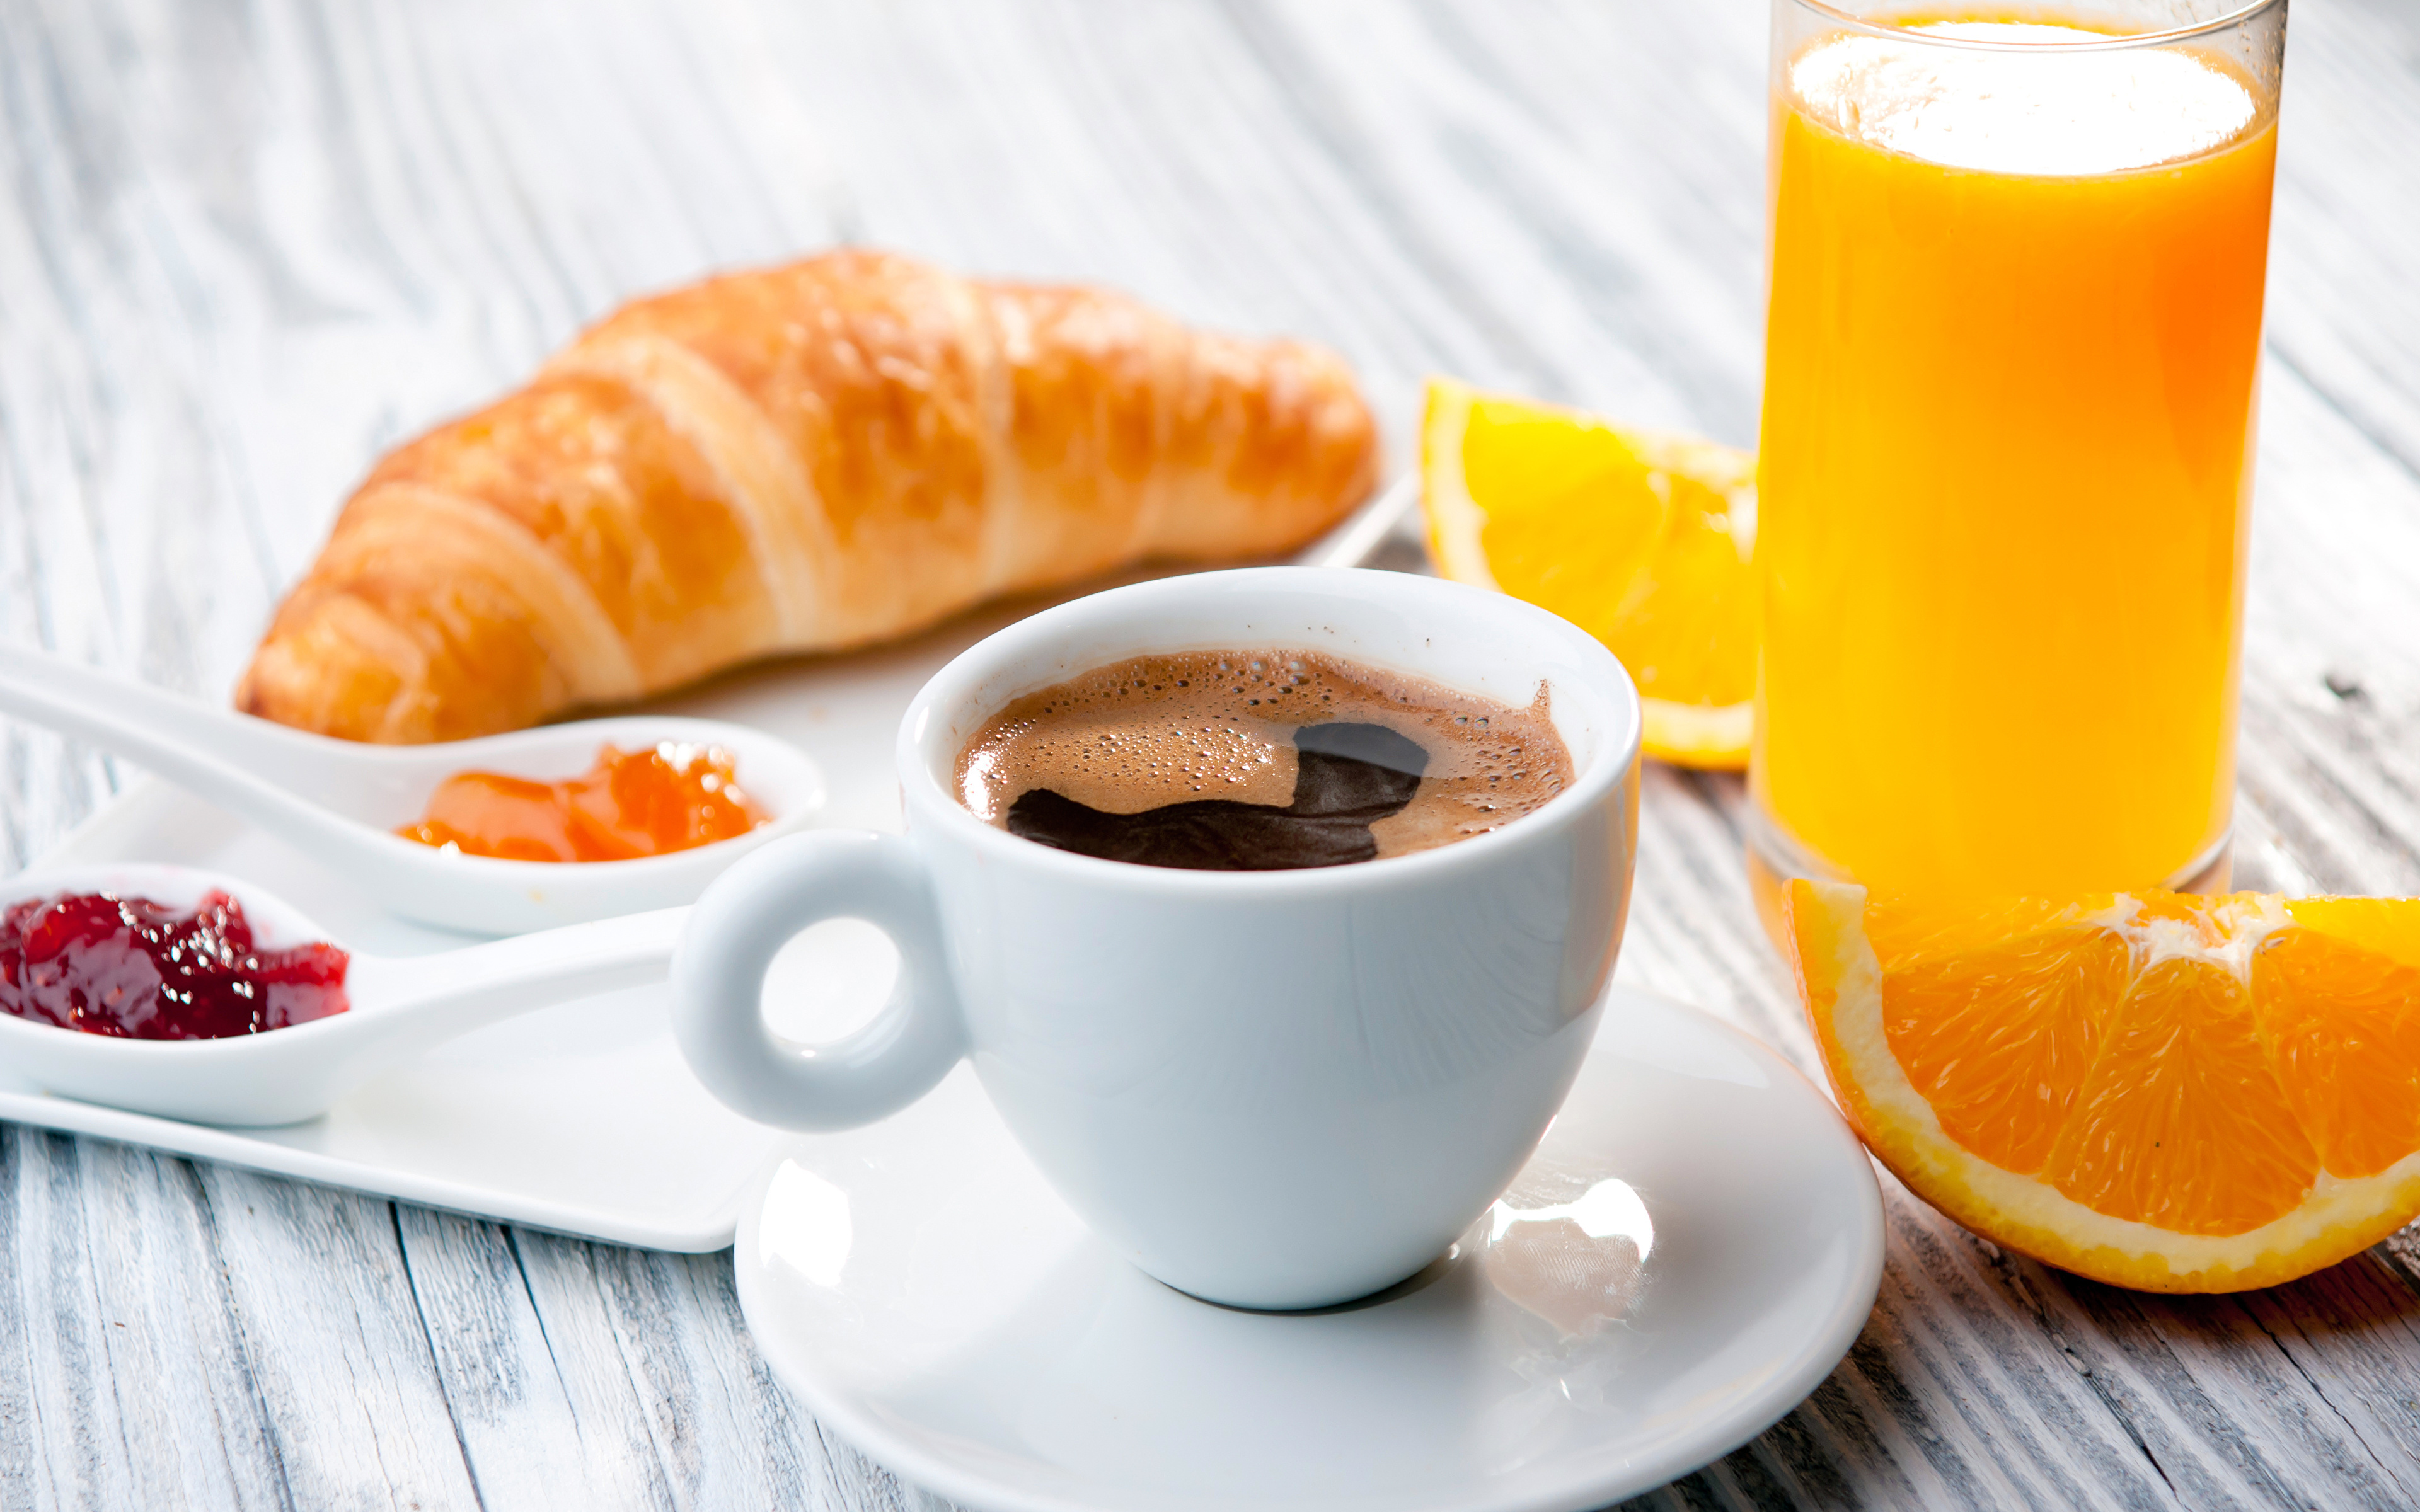 cafe y jugo de naranja